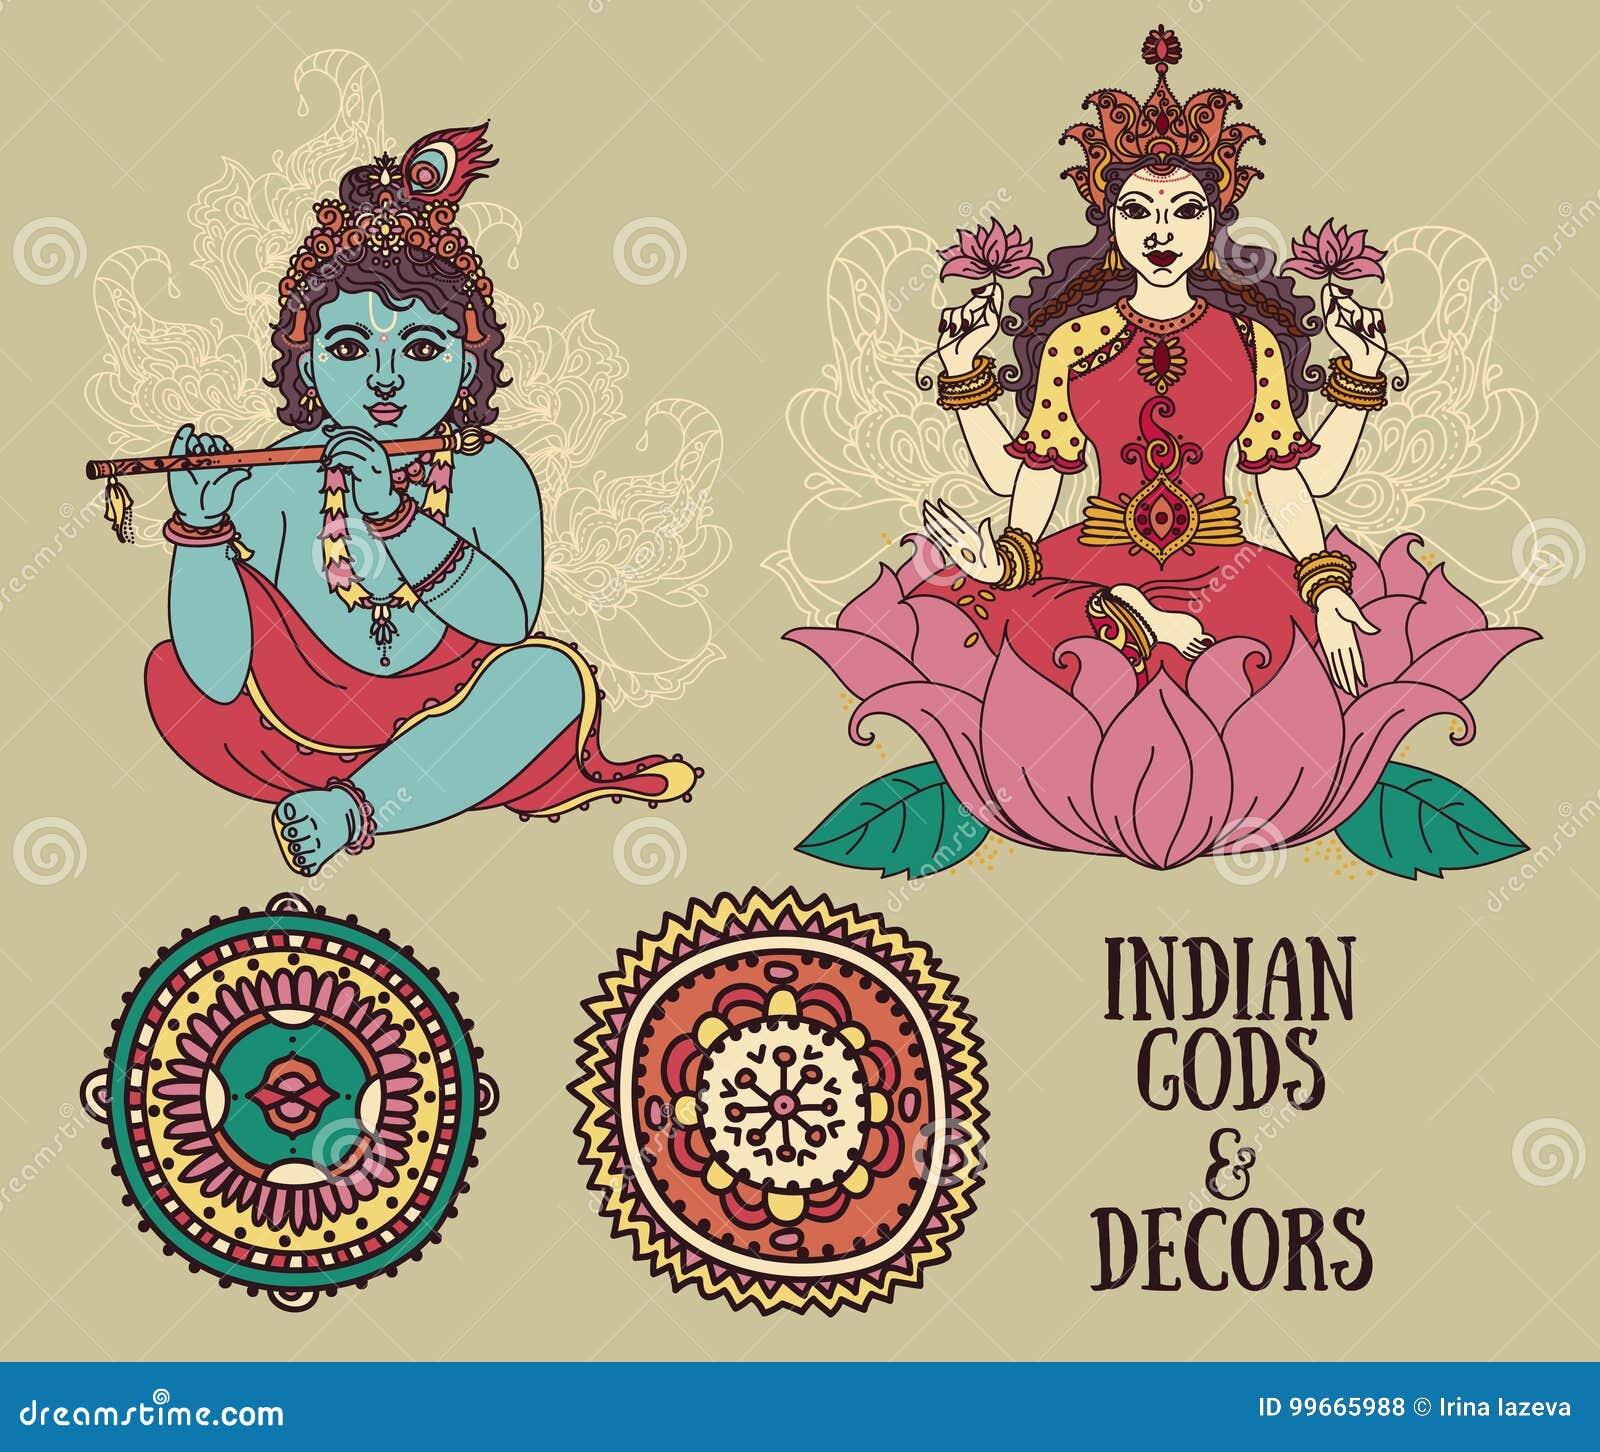 little krishna lakshmi and ethnic ornaments stock vector